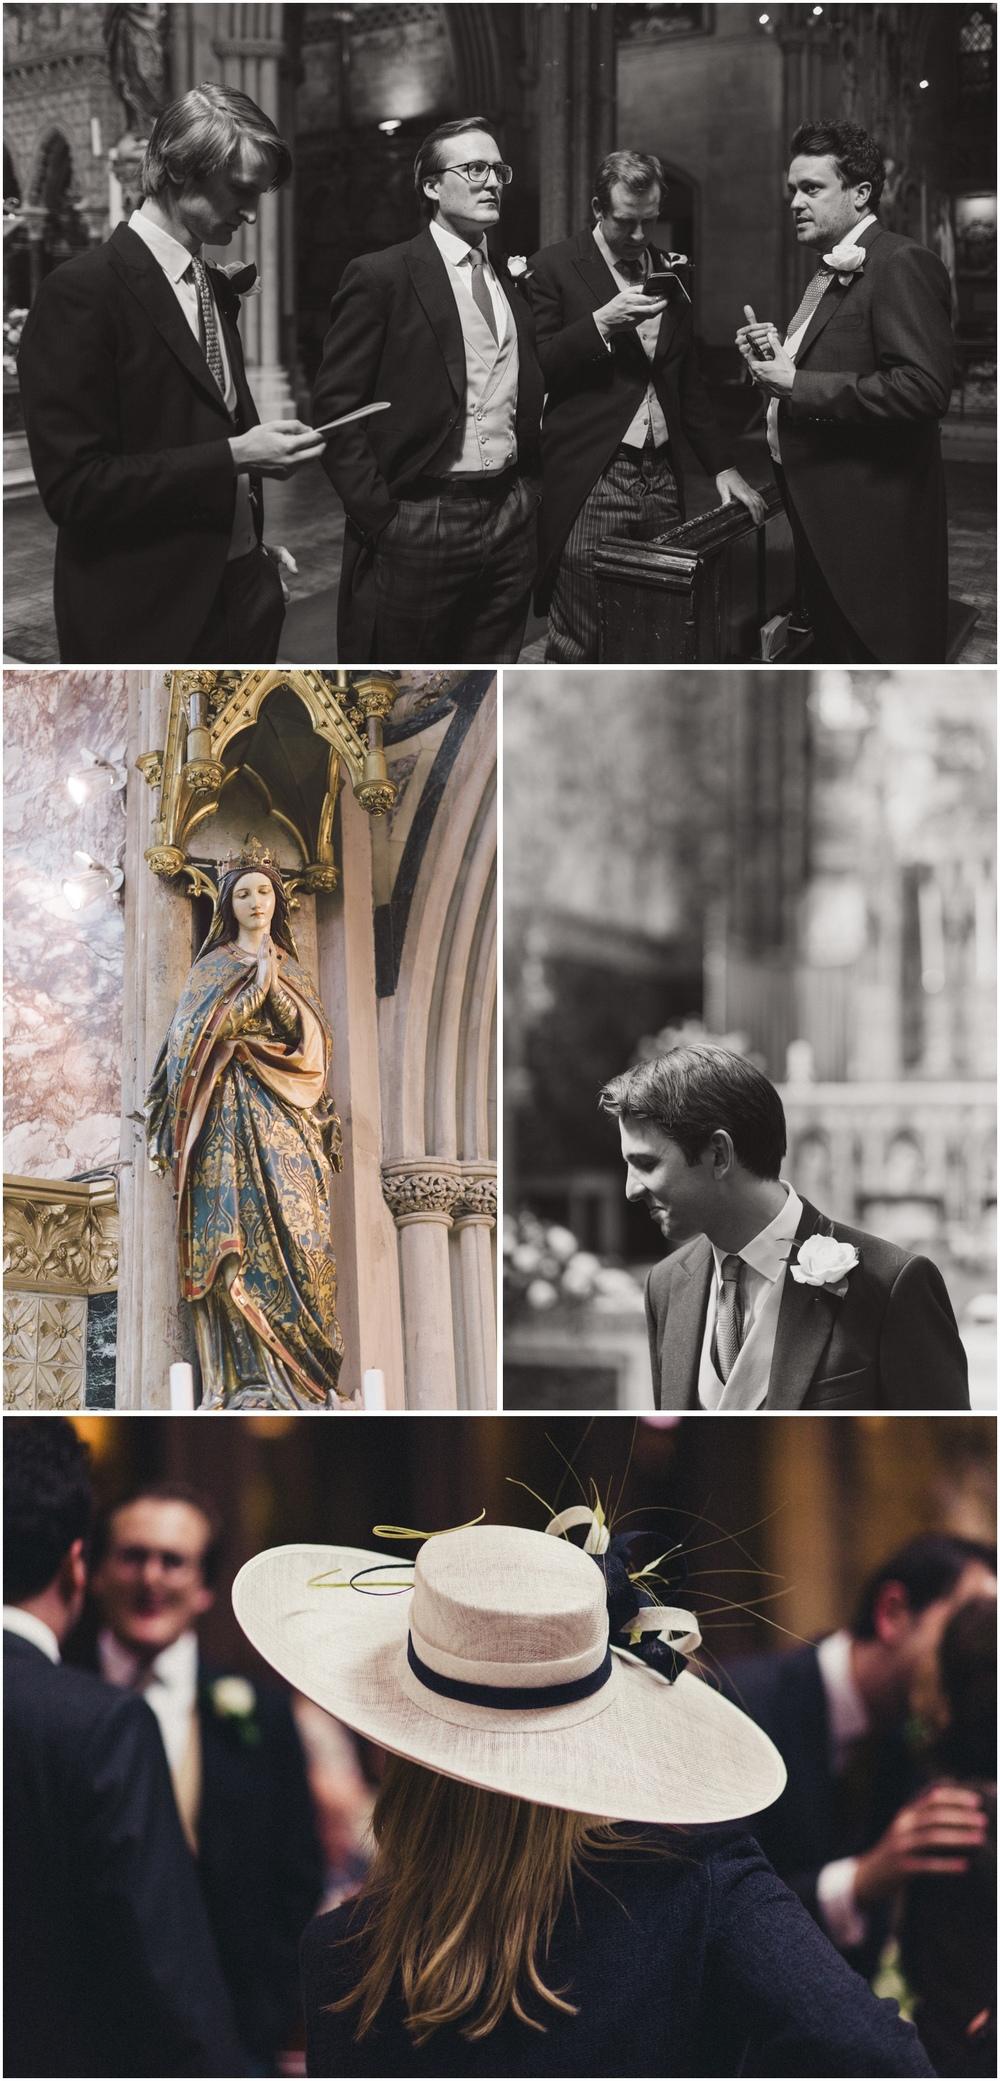 Mary & Rupert 7.jpg